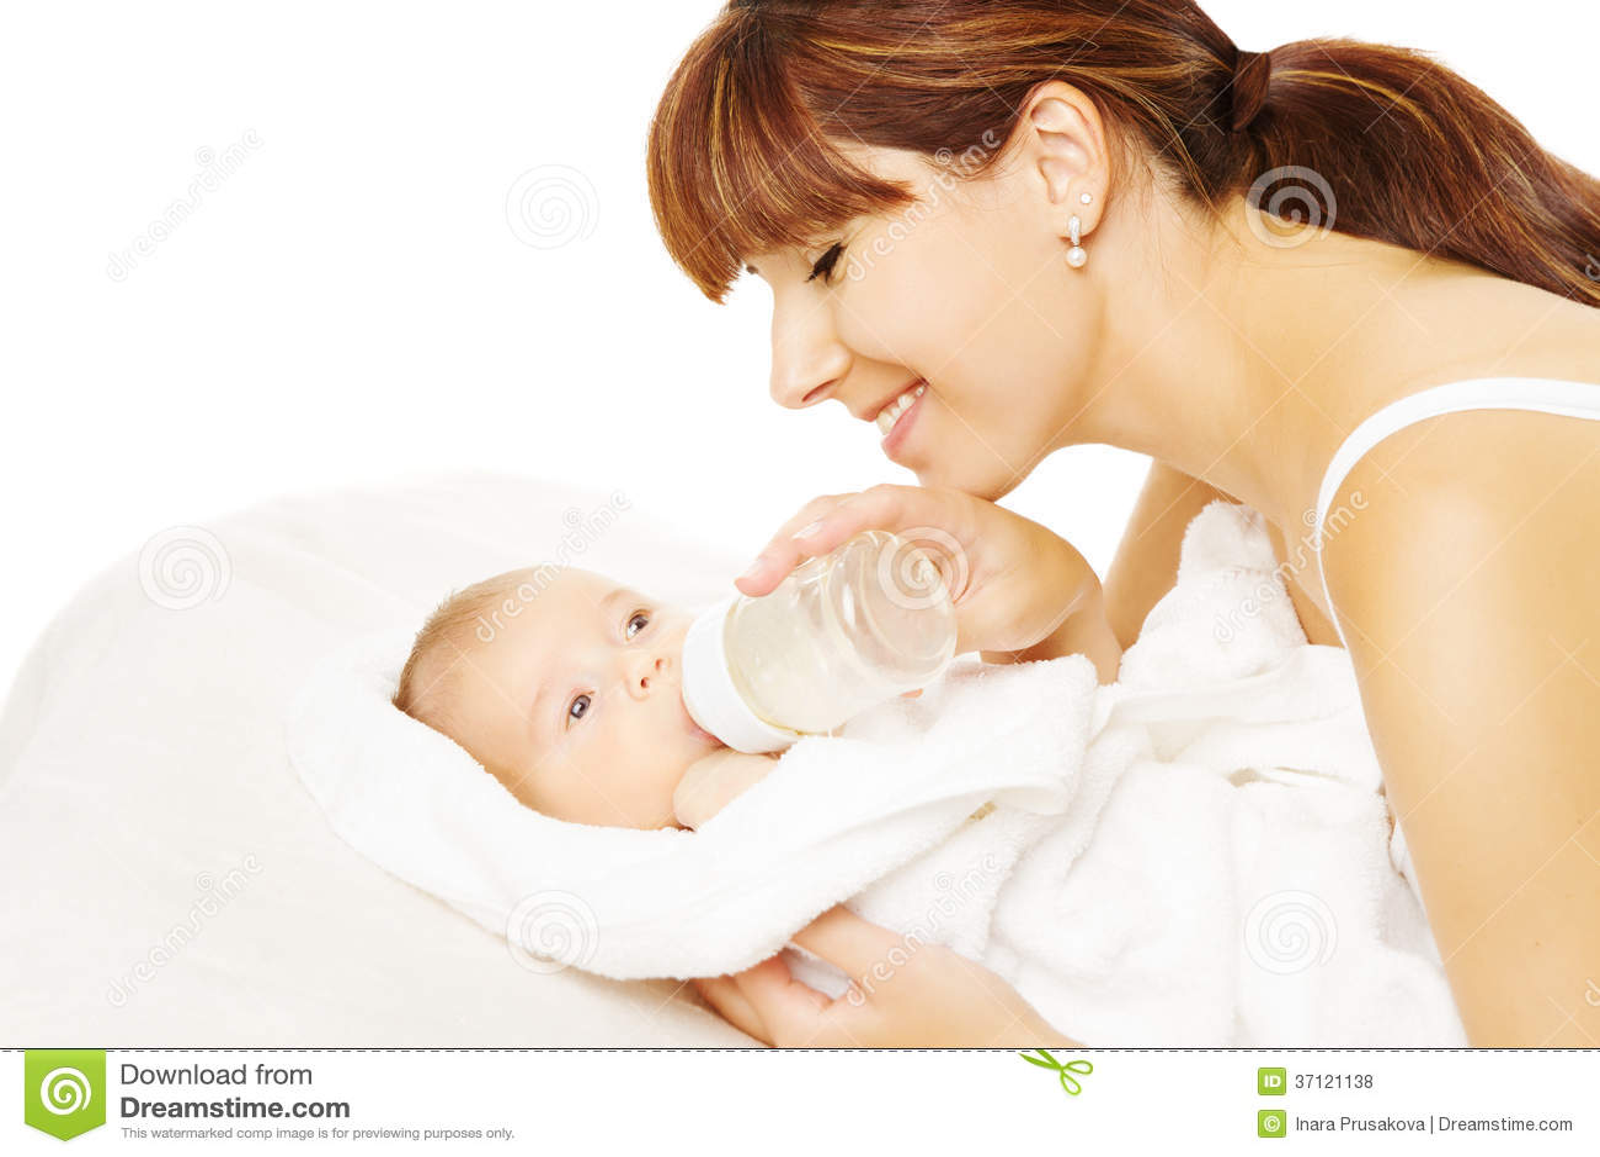 feeding baby  newborn eating milk from bottle  royalty